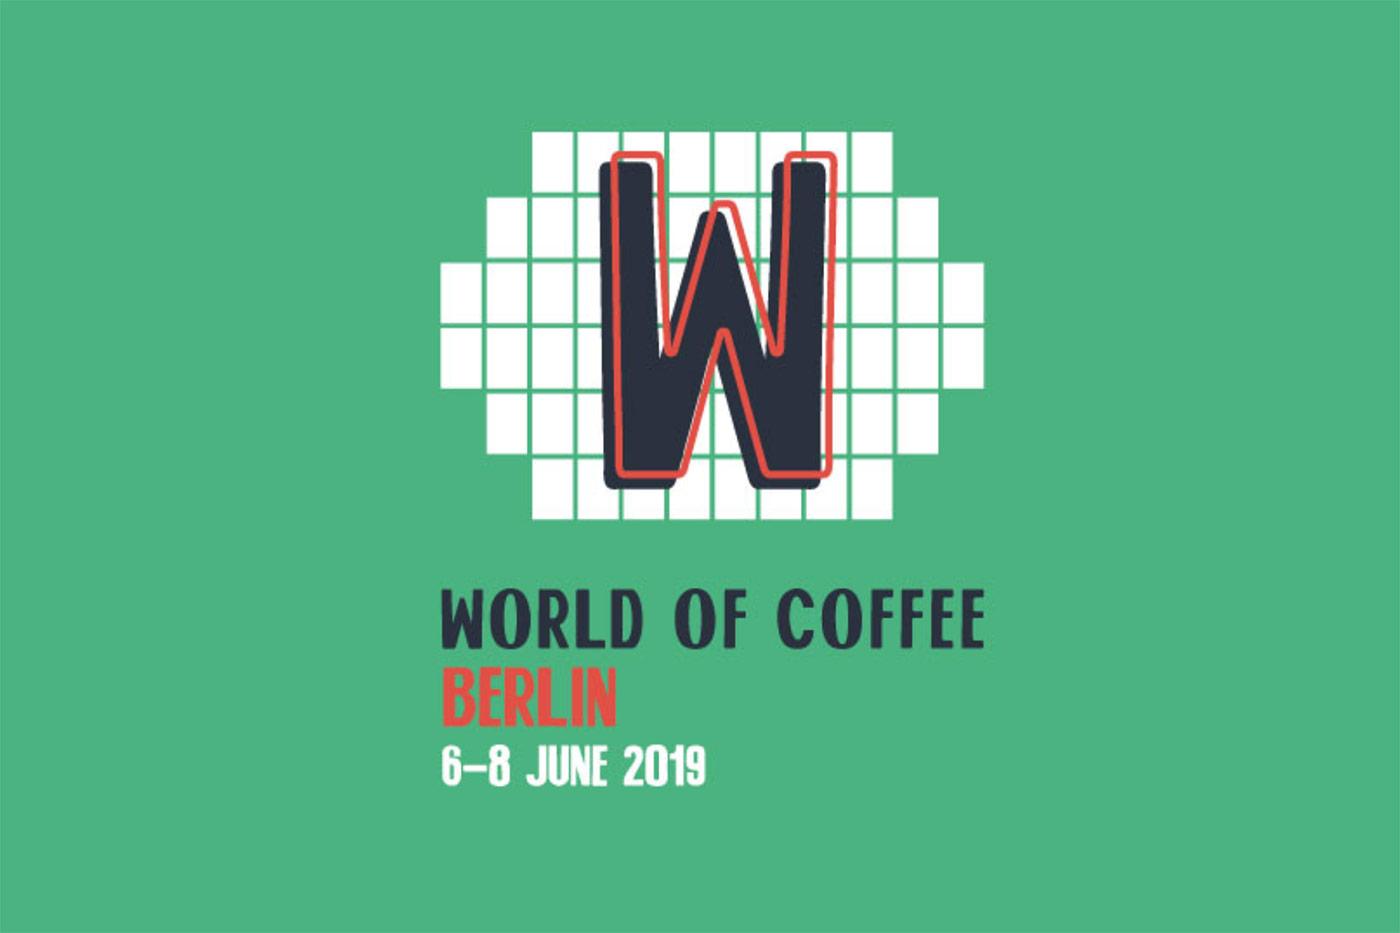 Kaffee-Events, Festival und Kalender: World of Coffee Berlin Festival. CafCaf – Kaffee & Blog, Kaffeeblog